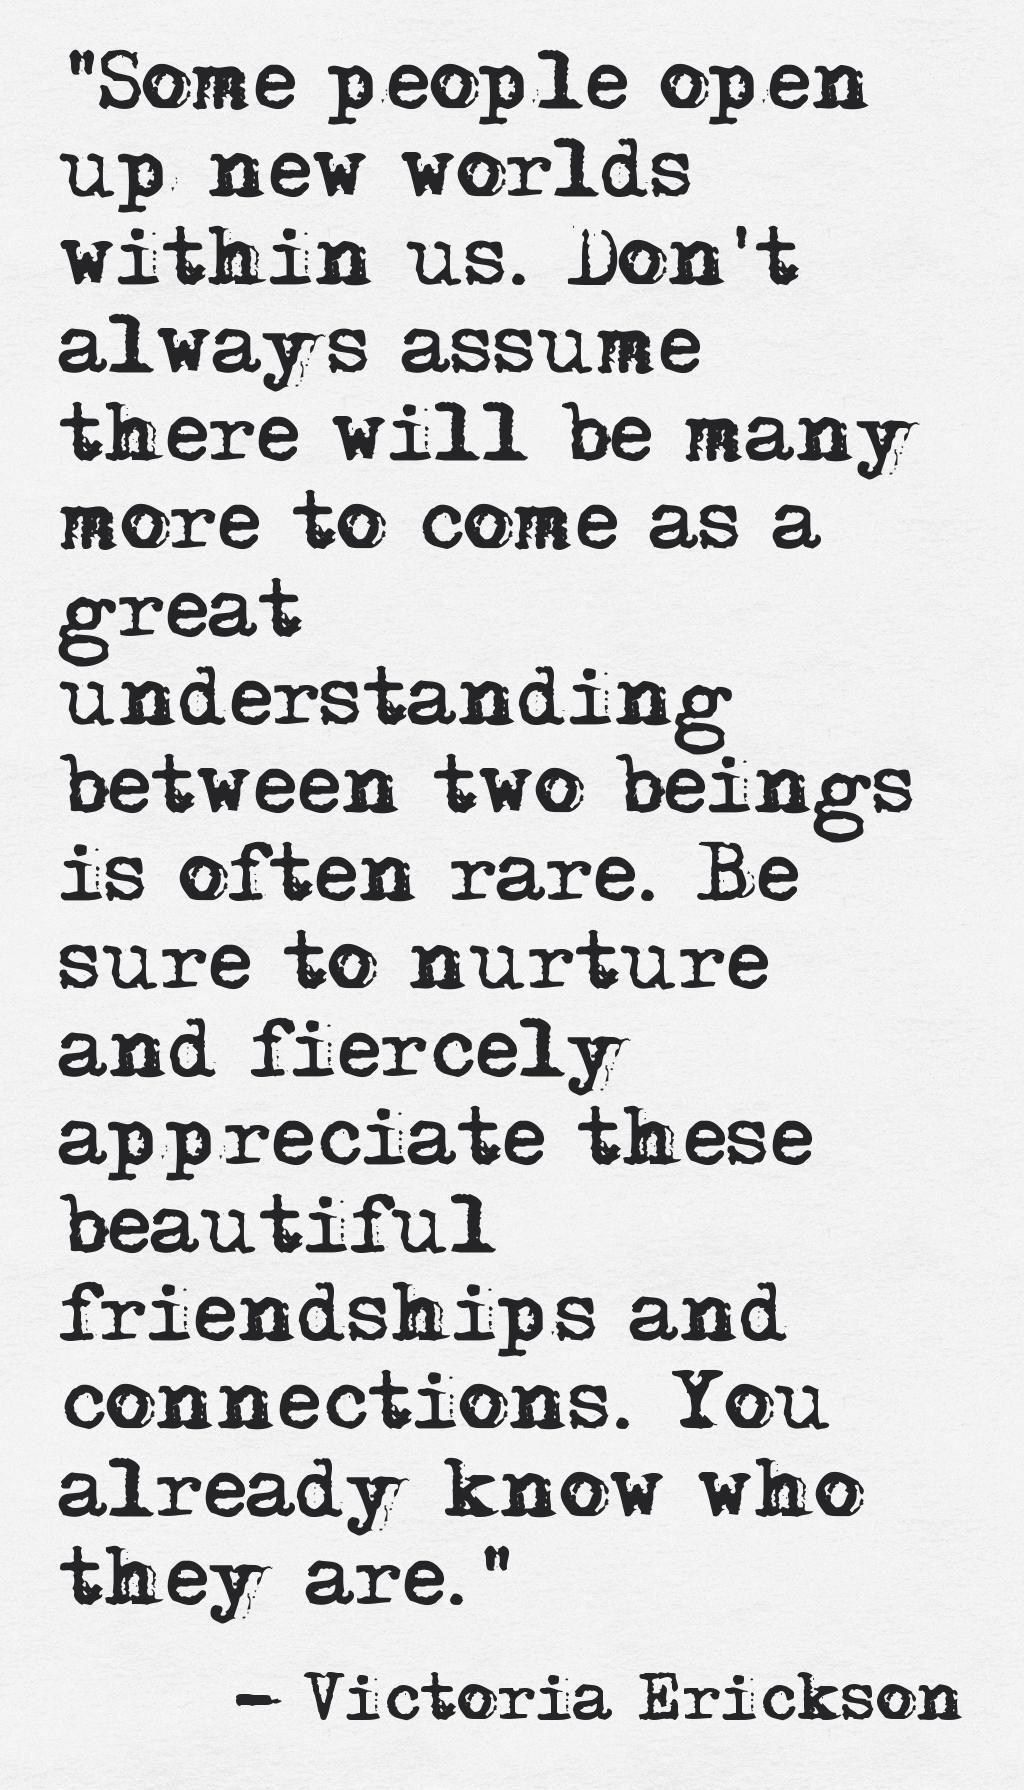 Appreciate them, it's rare. You already know who they are